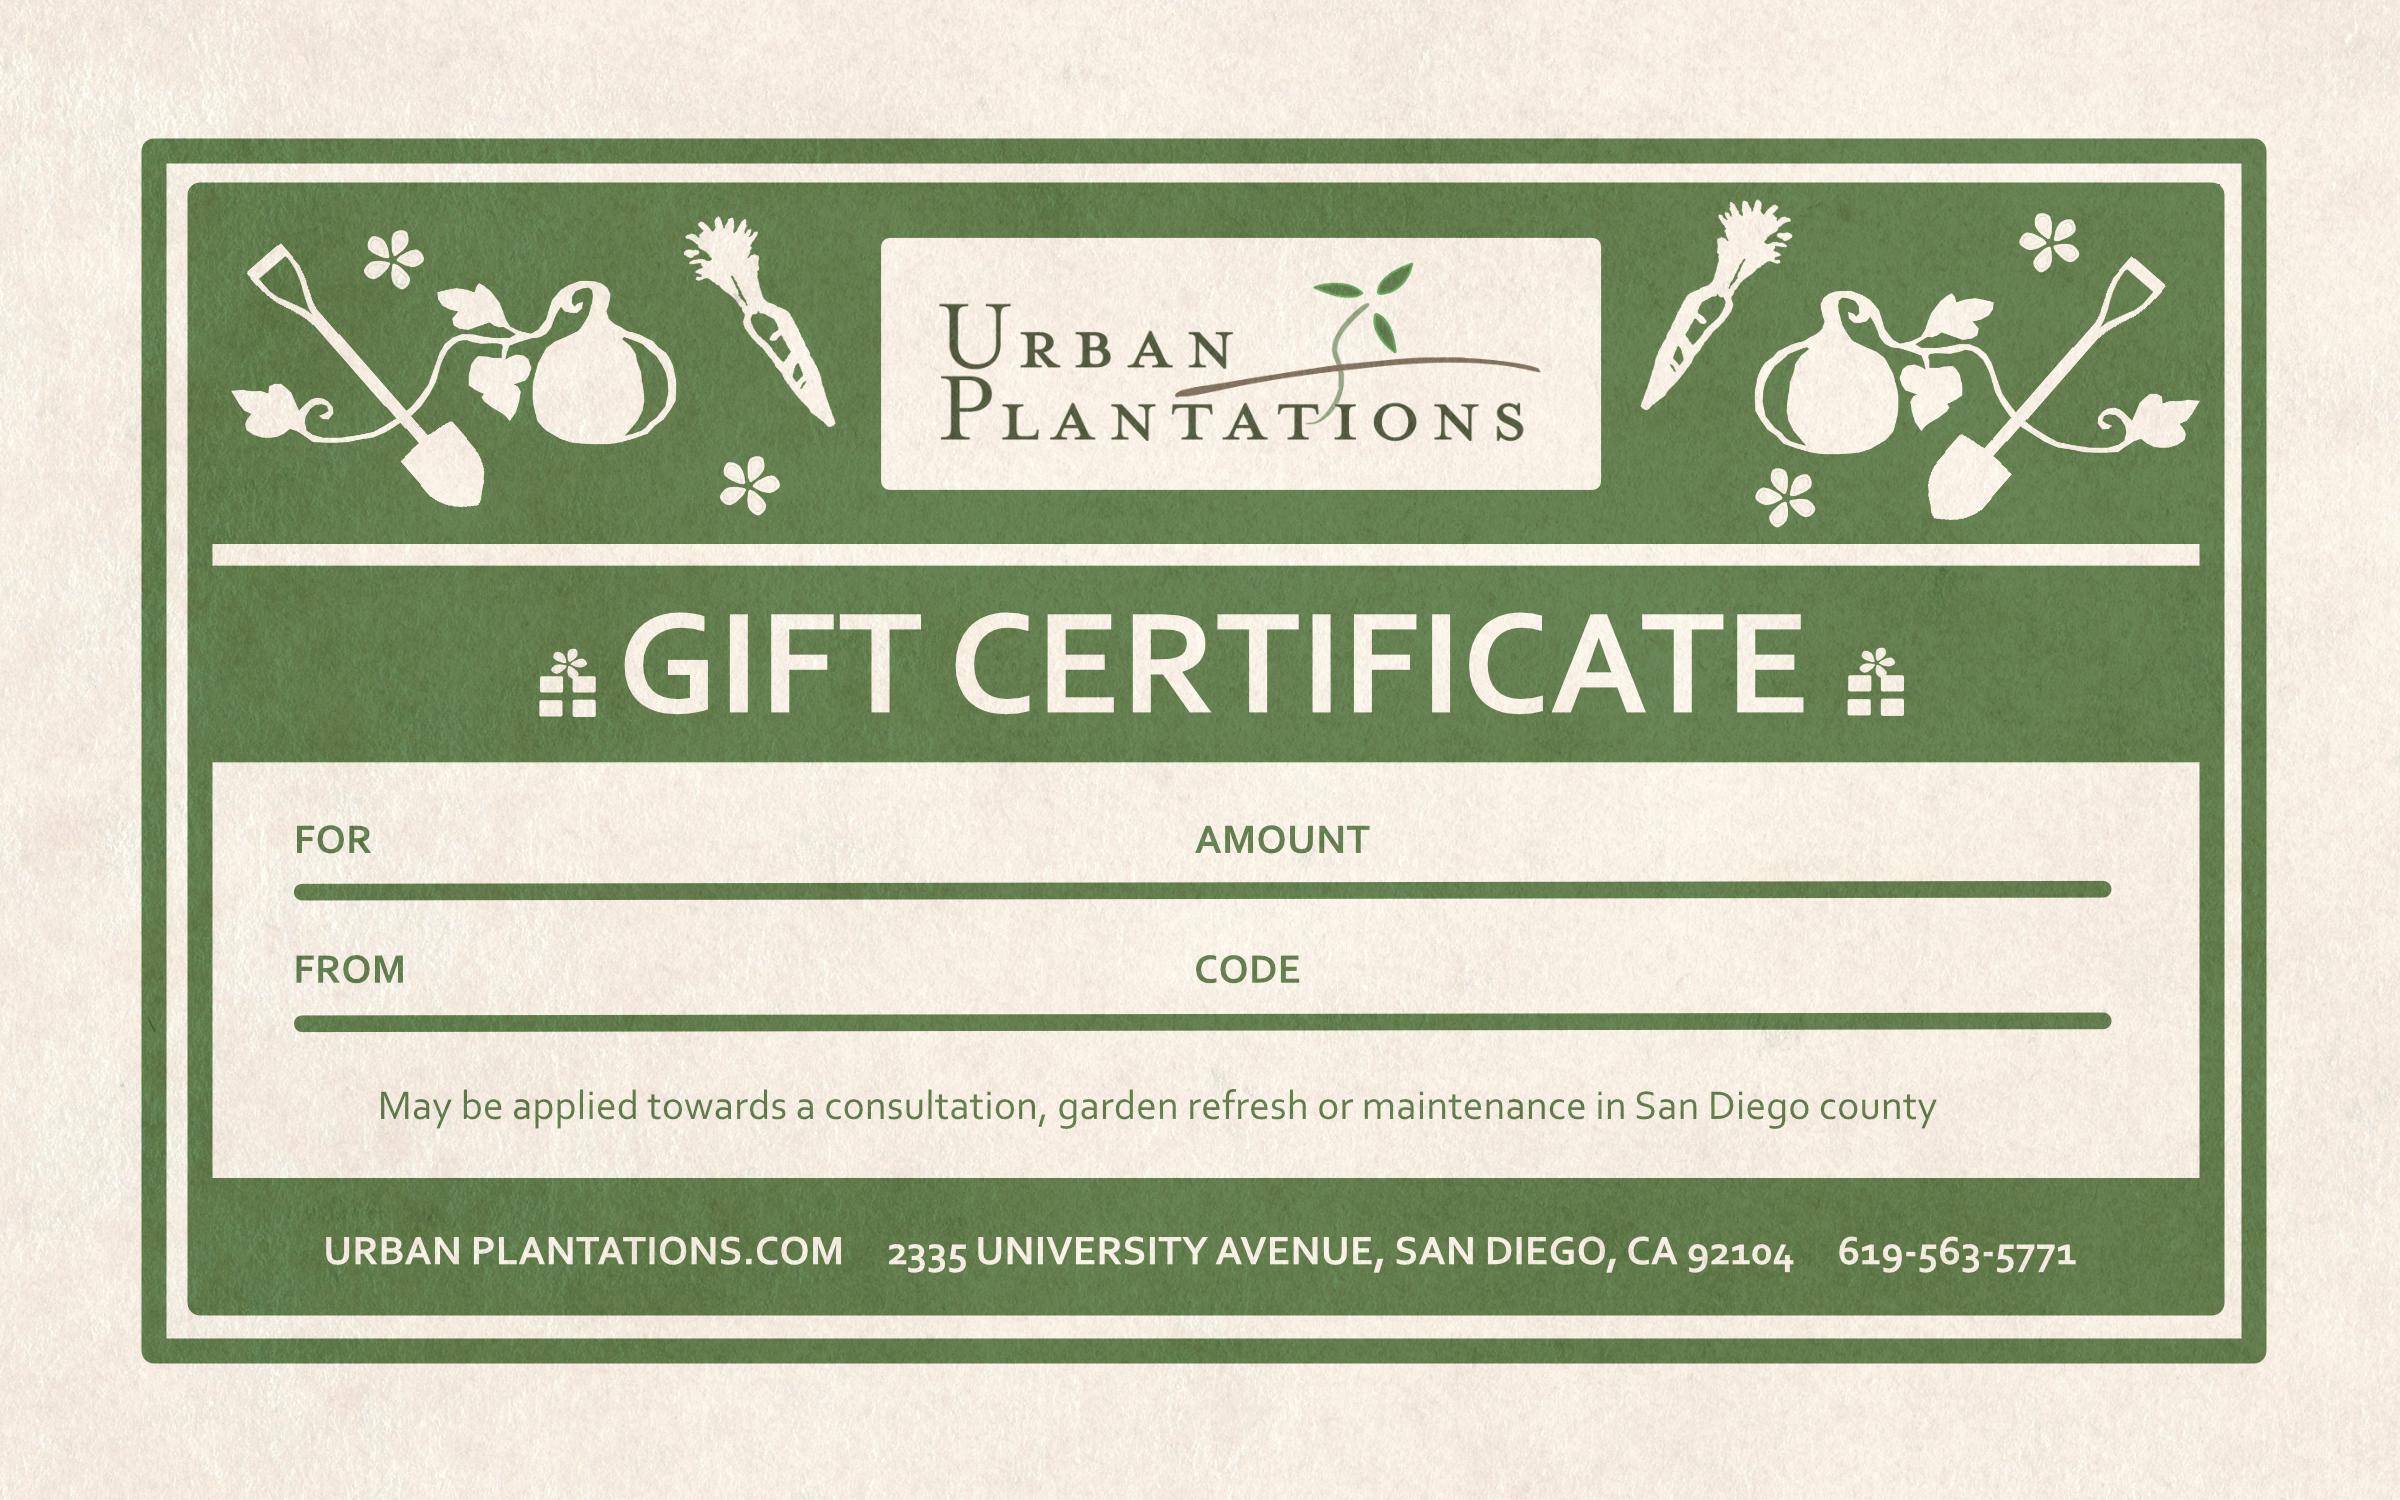 Urban Plantations Gift Certificate